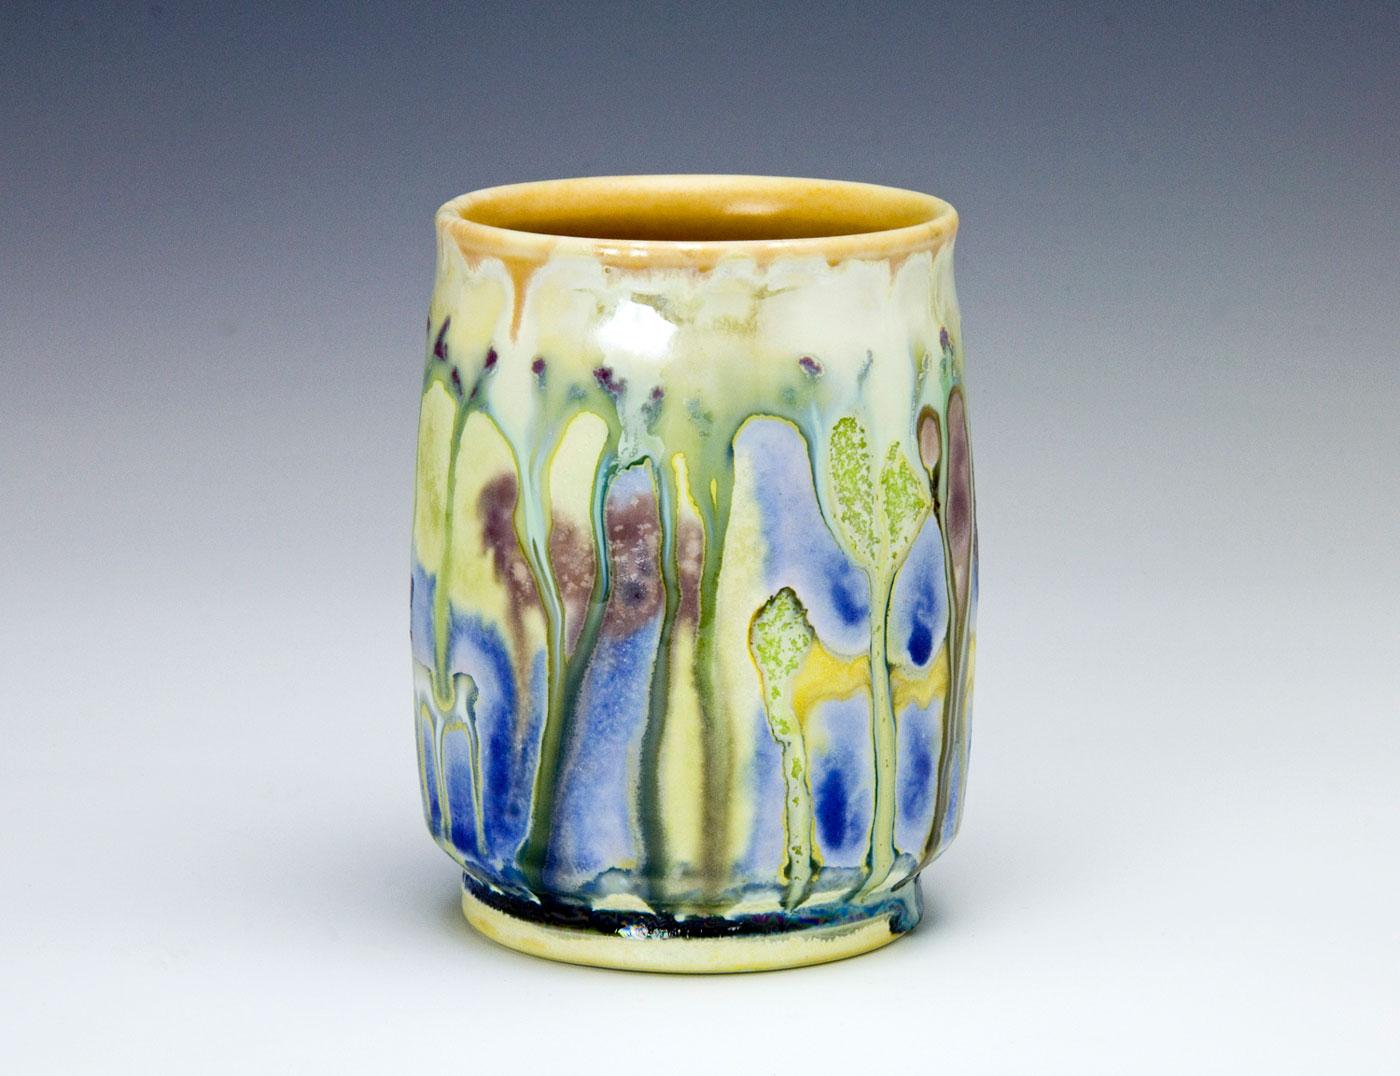 Art-Flow-crystalline-glazes-Samantha-Henneke-Seagrove-Pottery.jpg